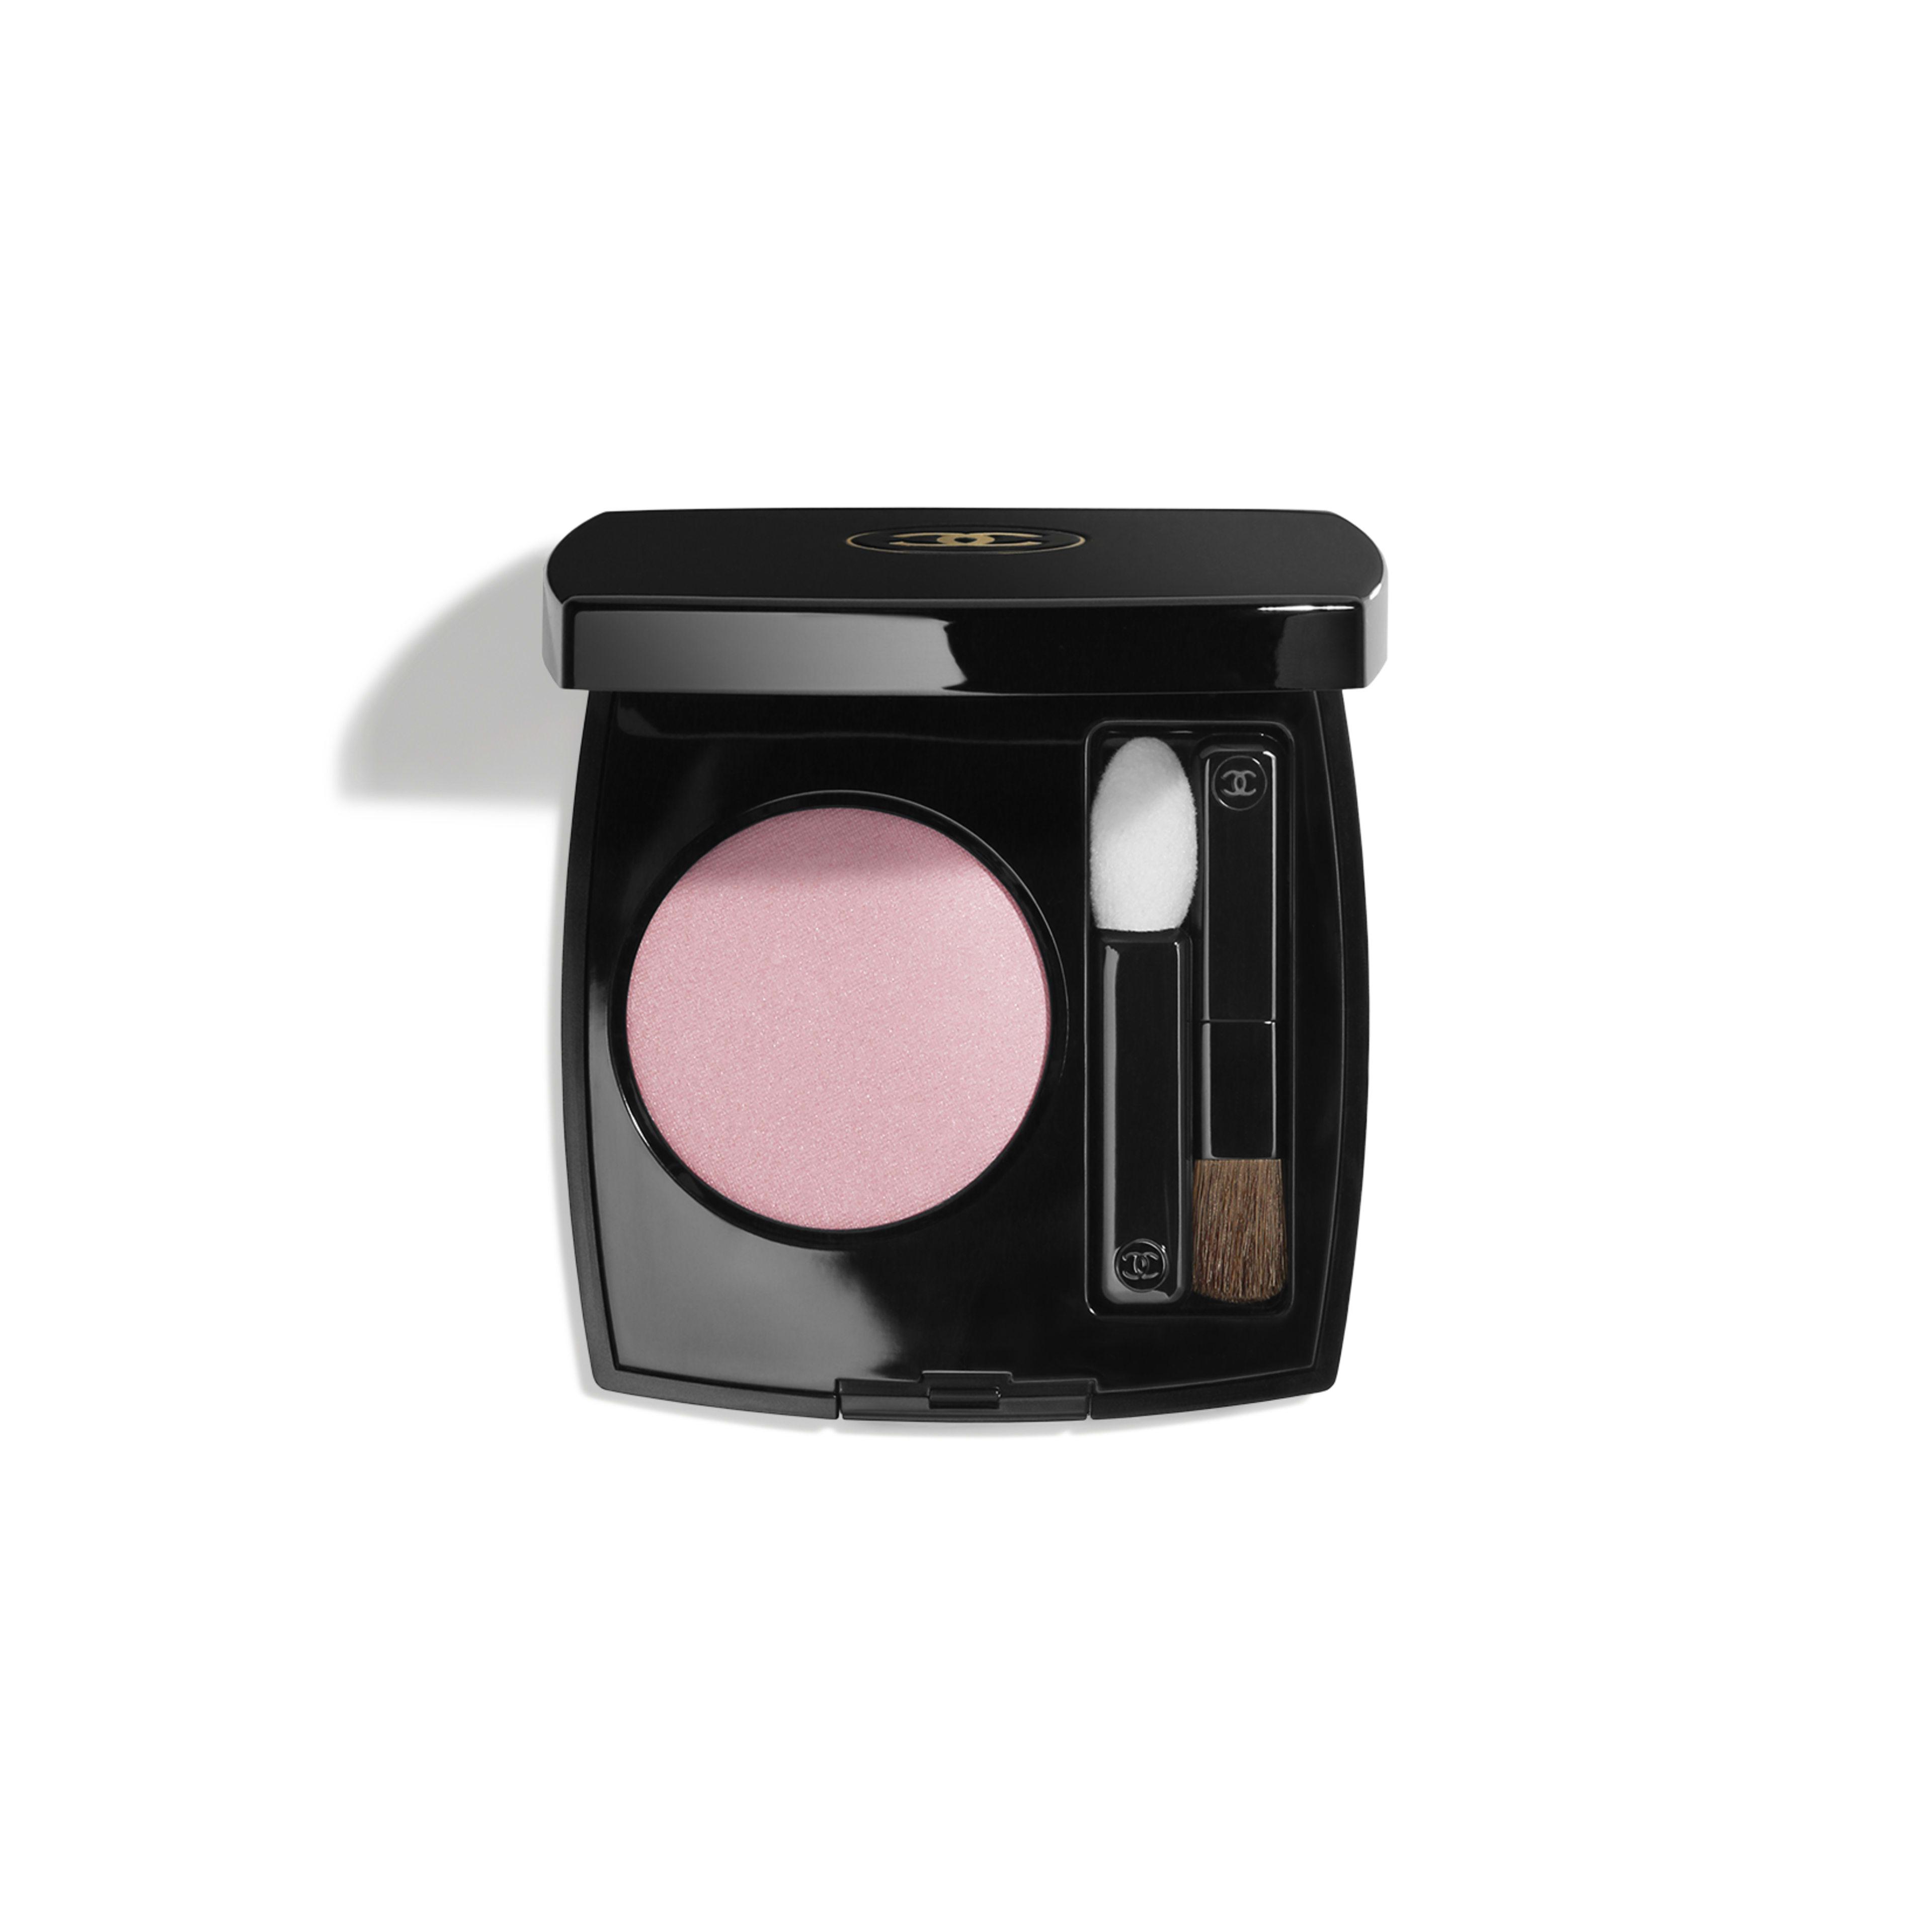 OMBRE PREMIÈRE - makeup - 2.2g - มุมมองปัจจุบัน